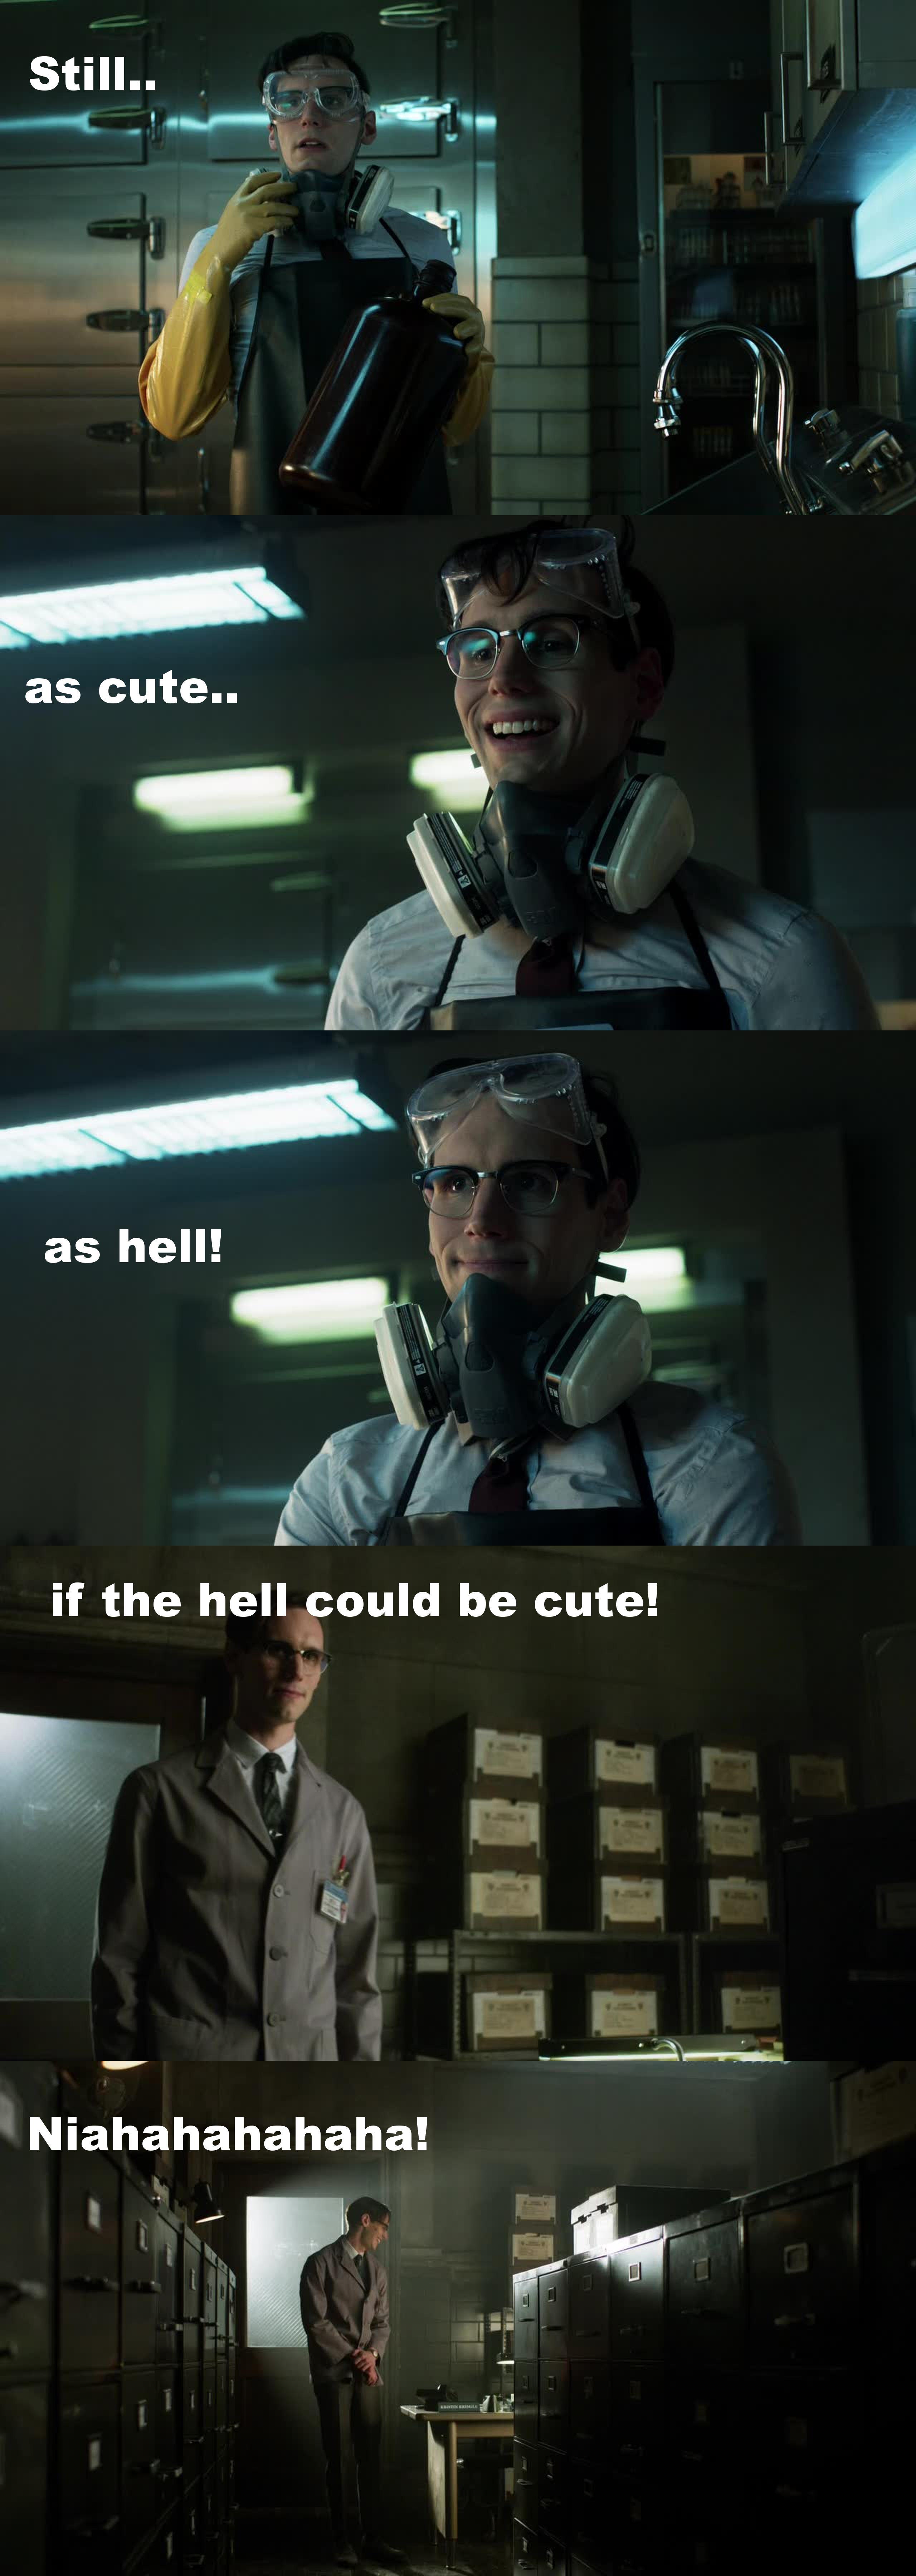 the cutest villain ever!